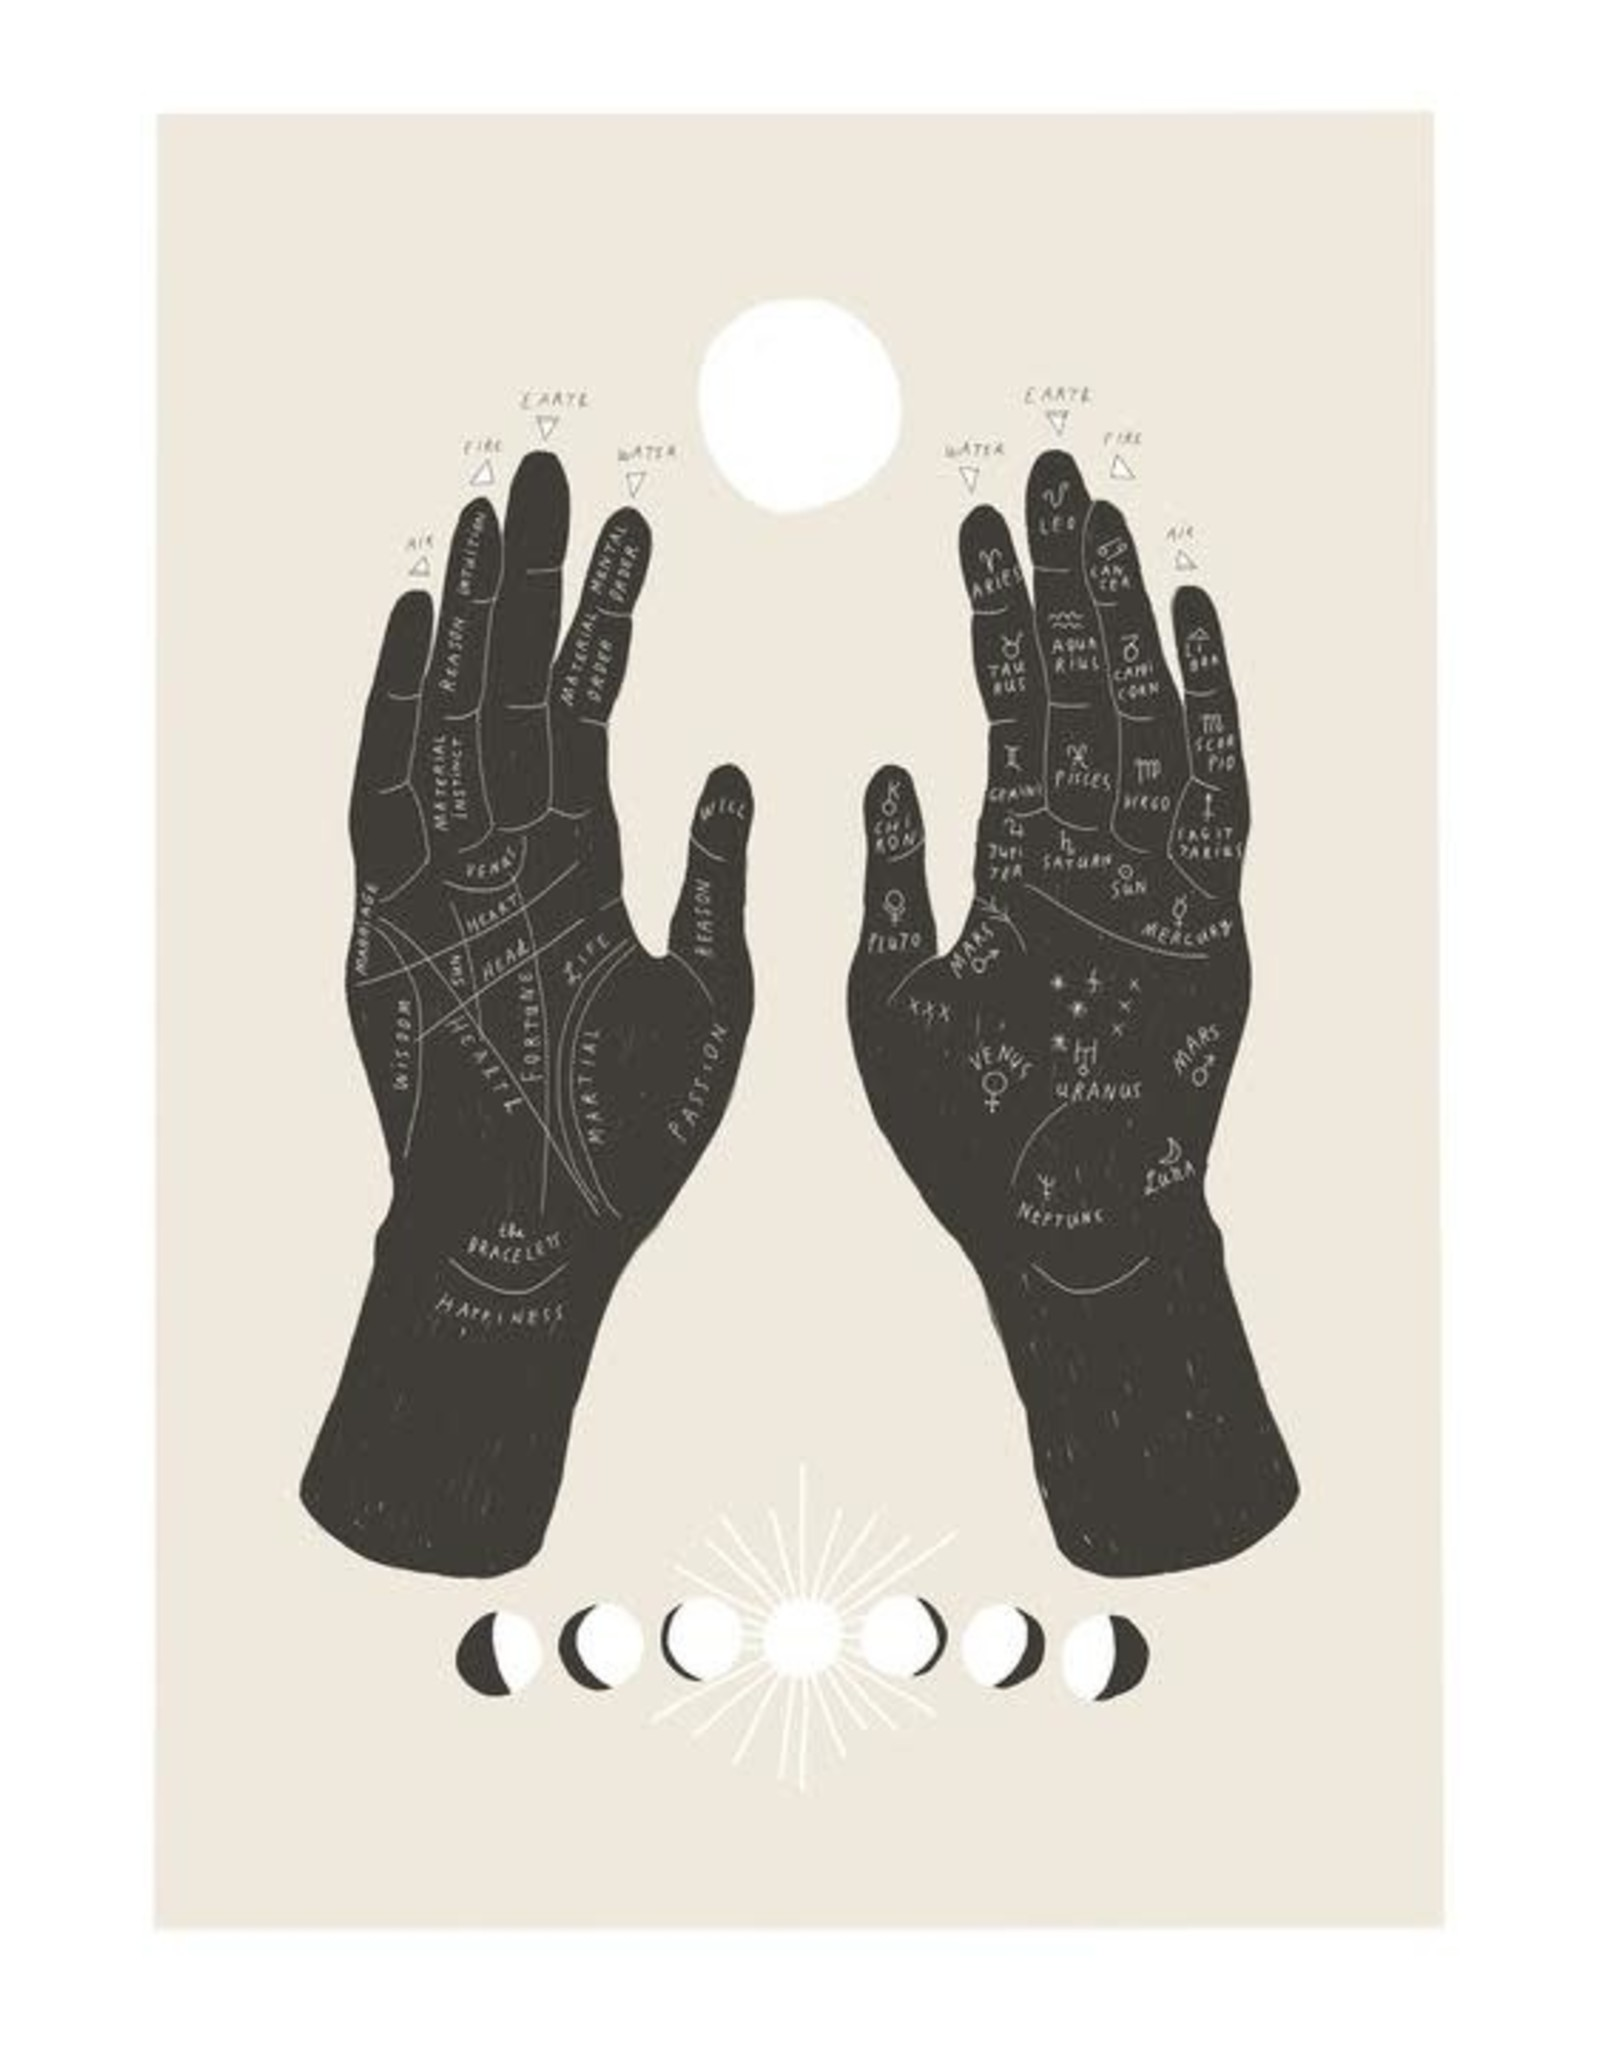 Baltic Club Palmistry Art Print - 8''x10''